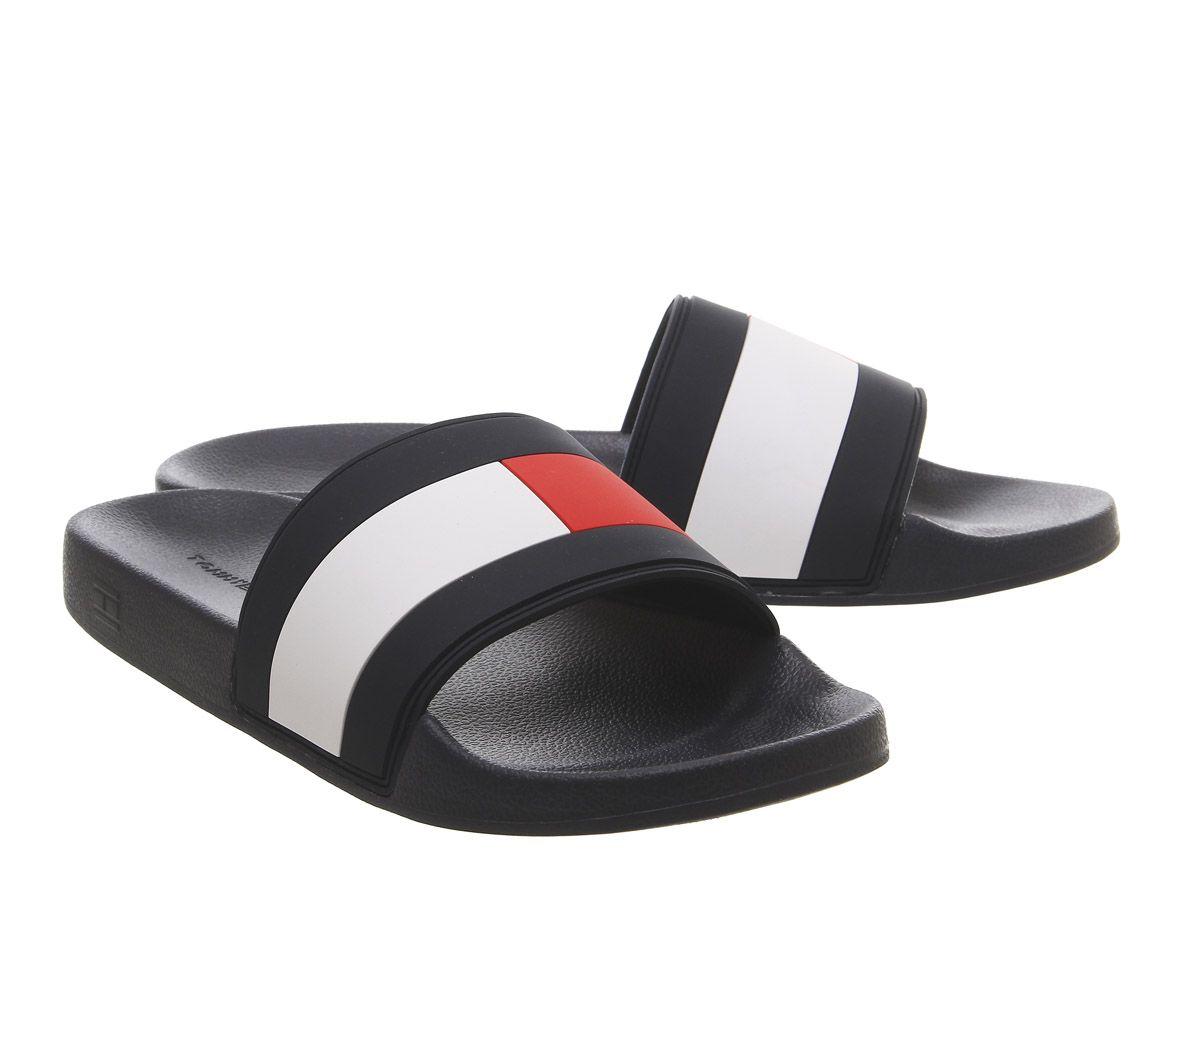 3cbe33103 Mens Tommy Hilfiger Flag Pool Slides Navy White Red Sandals